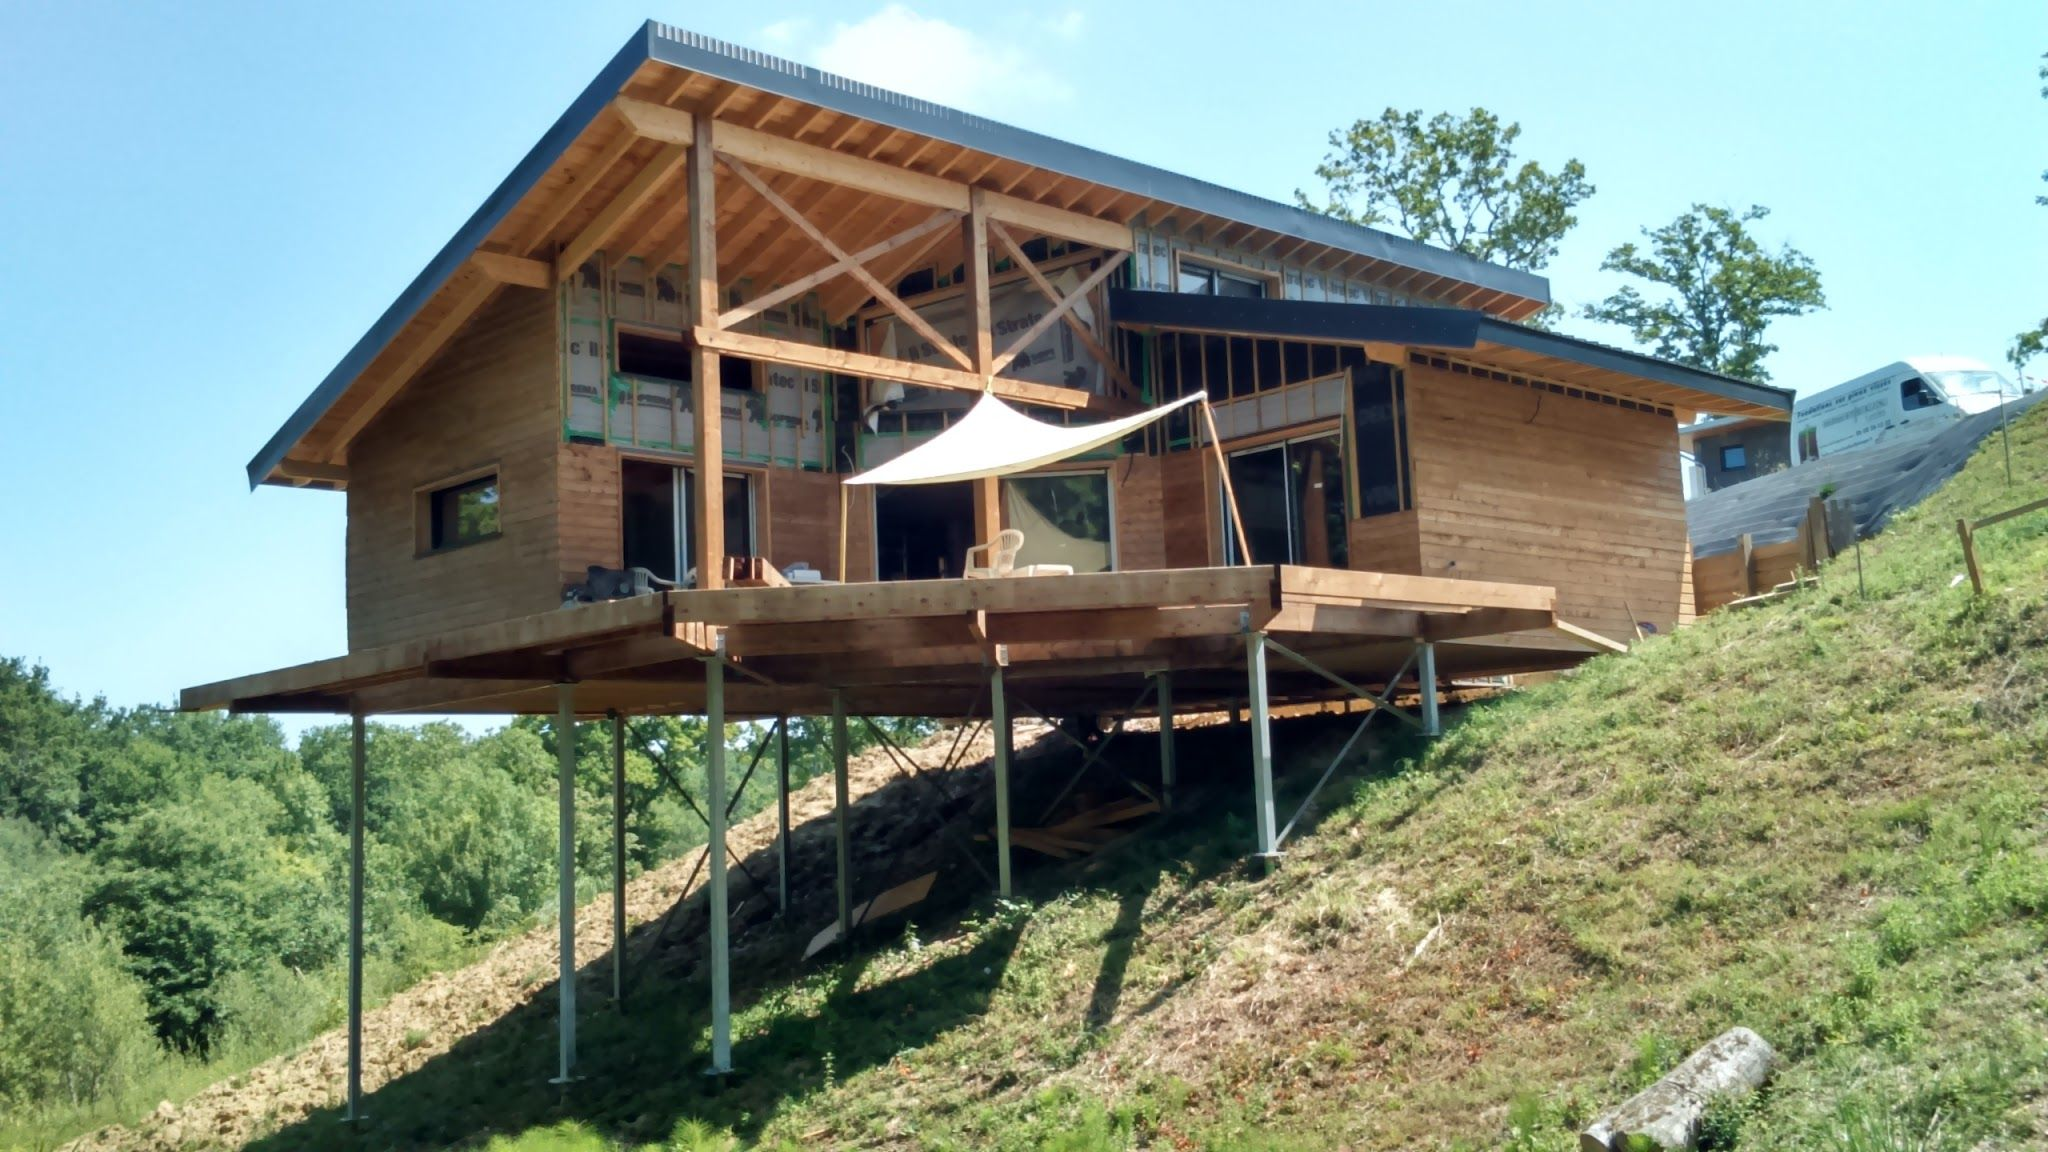 Maison Individuelle Sur Terrain En Pente   Techno Pieux Inc. | Steel Post  And Beam | Pinterest | Cabin, House And Architecture